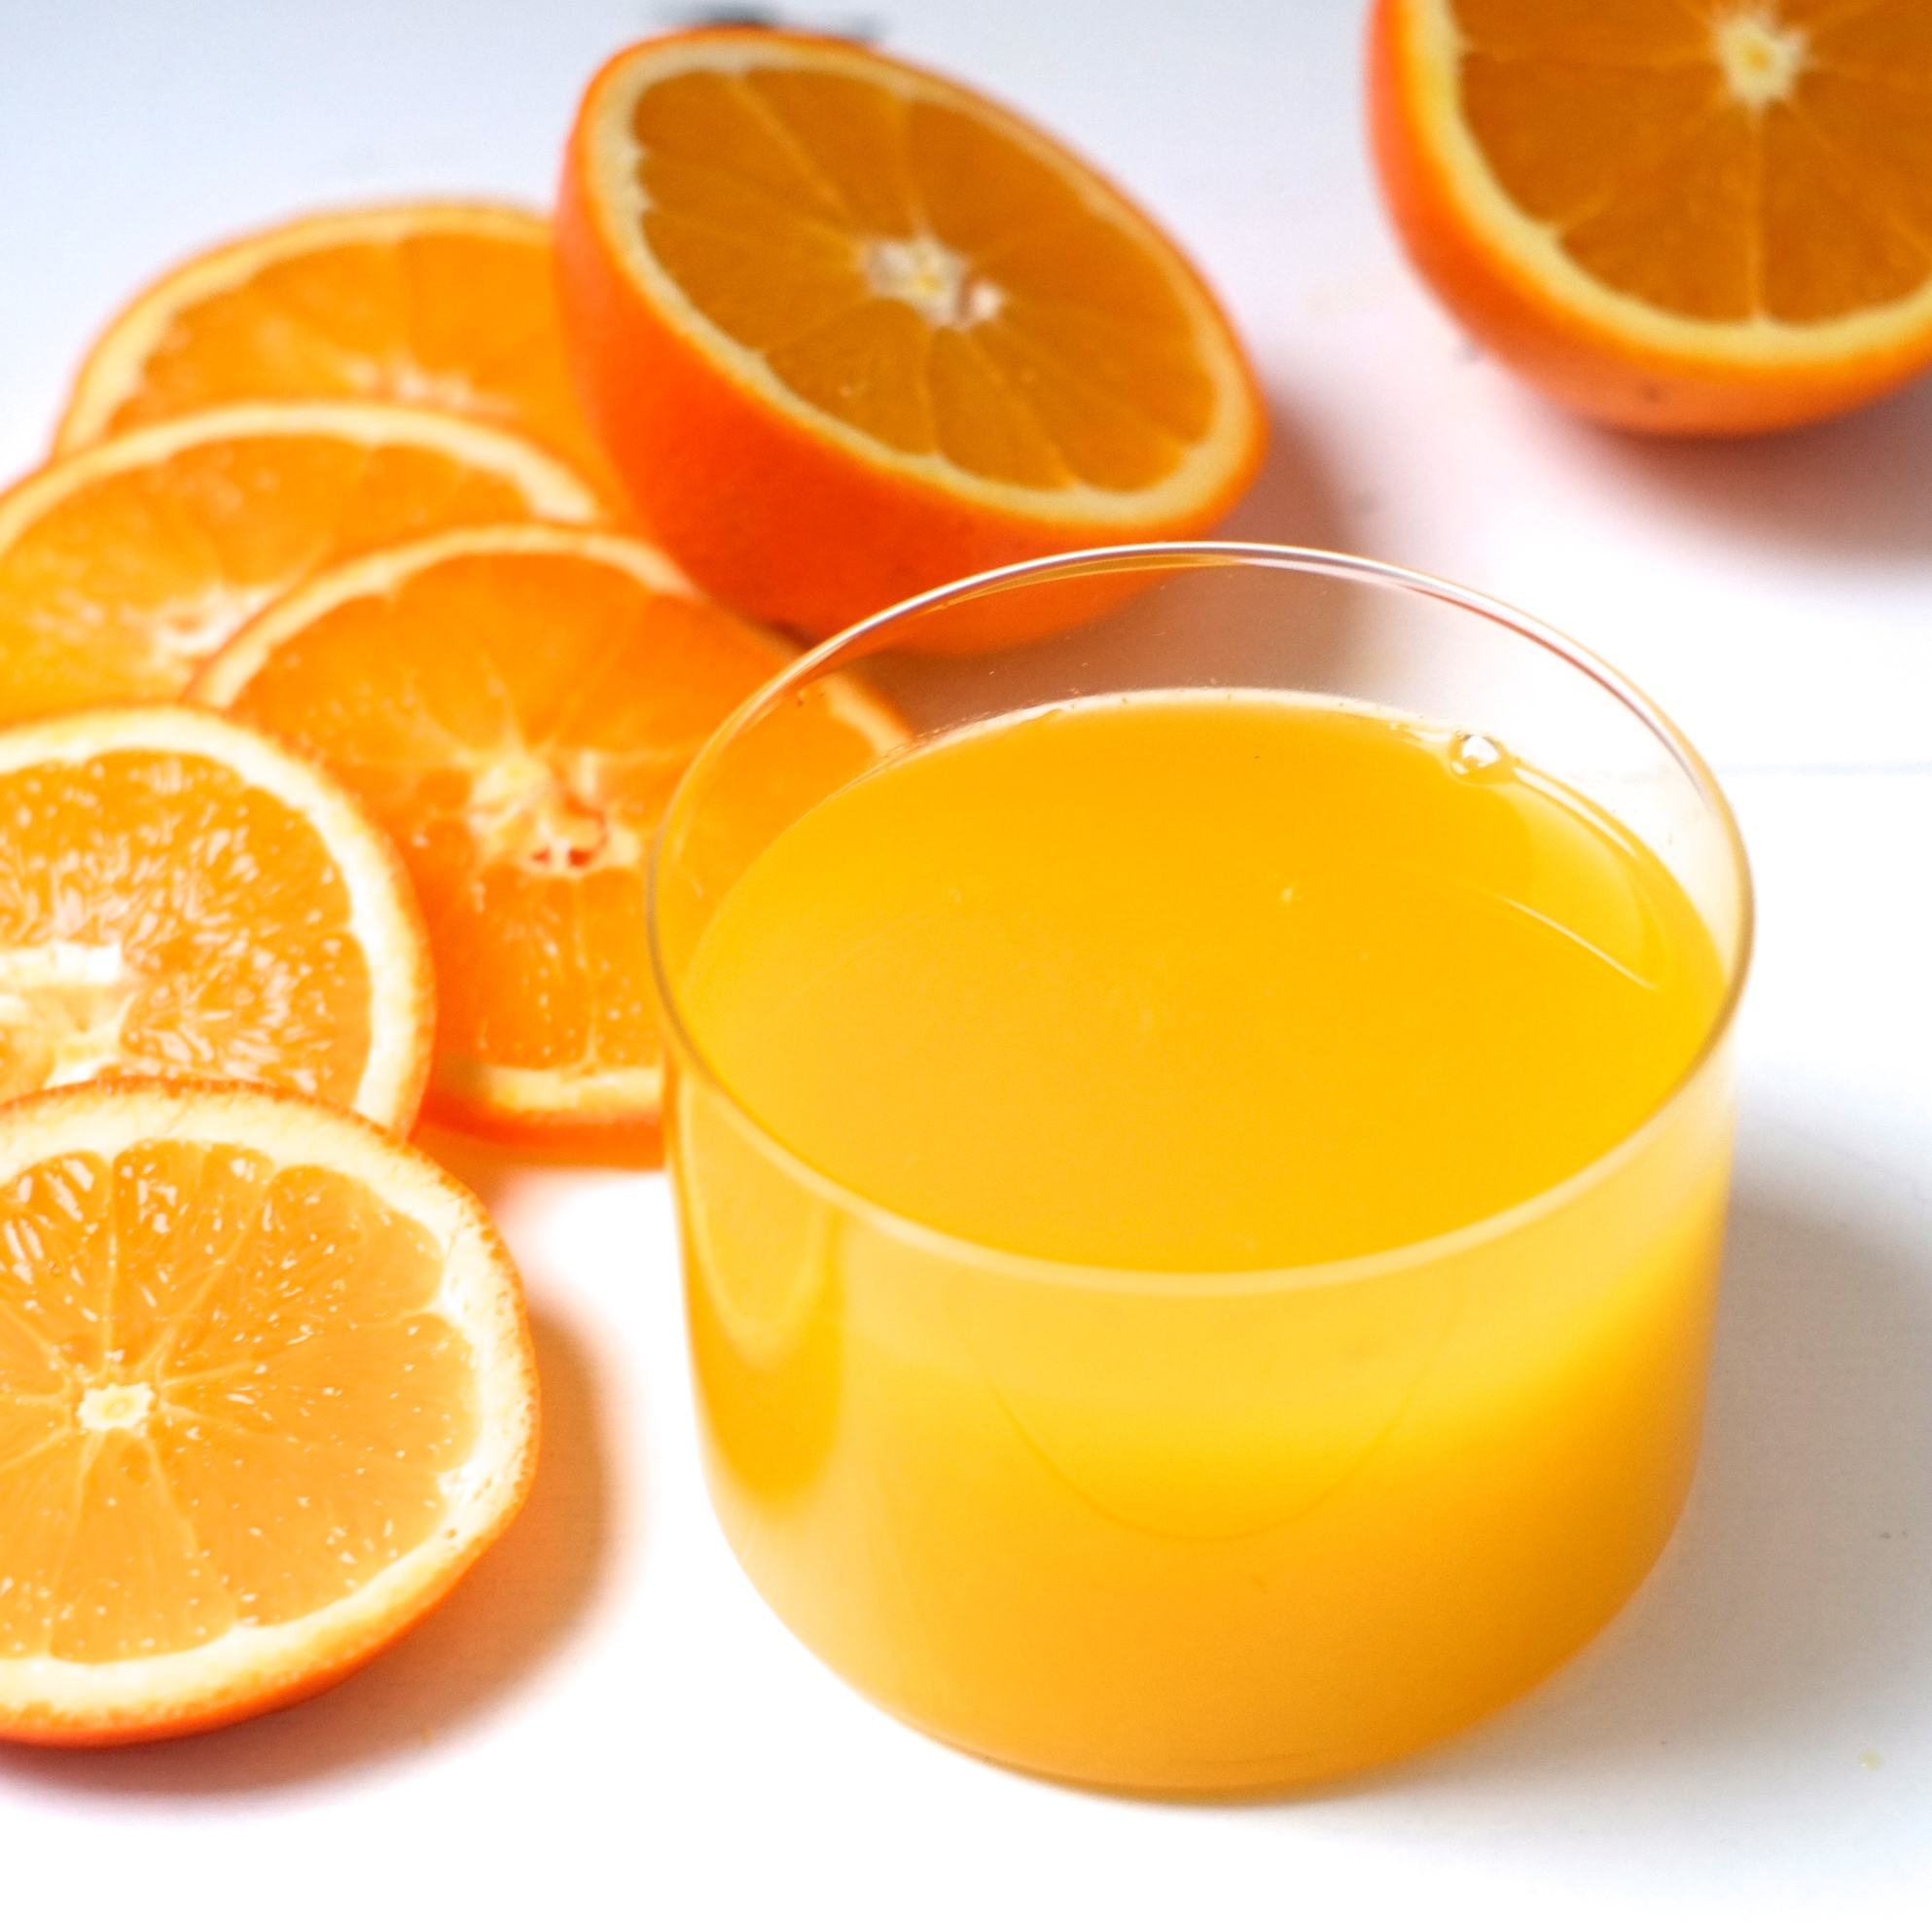 Jus d'orange pressé (25 cl)